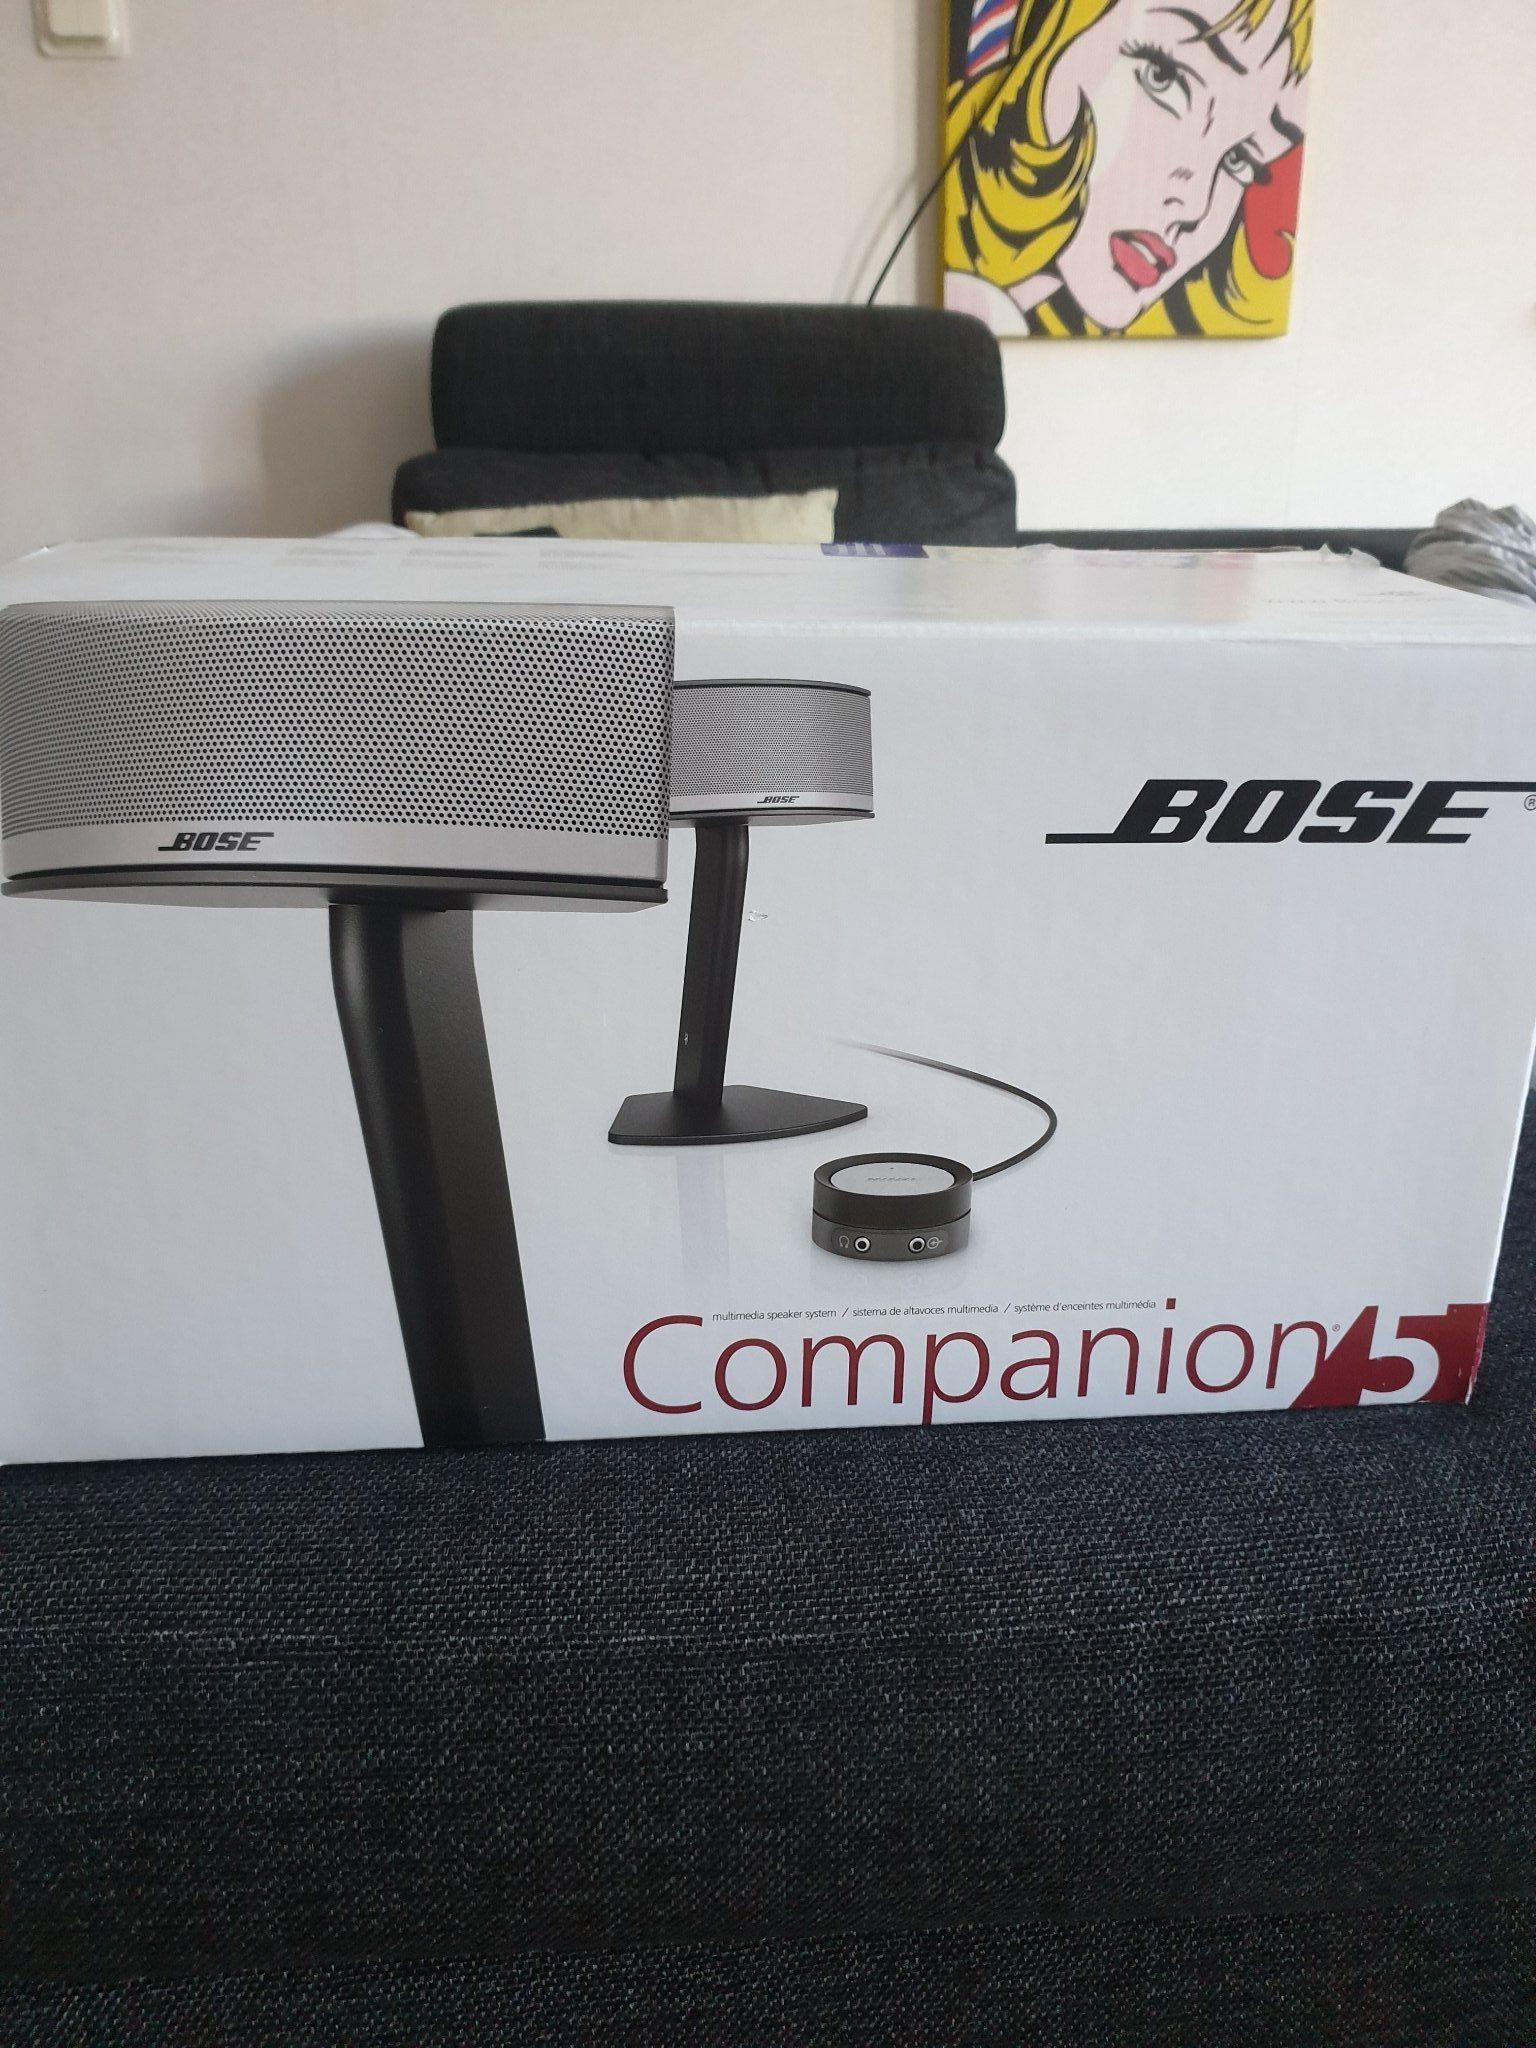 Bose companion 5 (341652234) ᐈ Köp på Tradera 1a77e660ae223